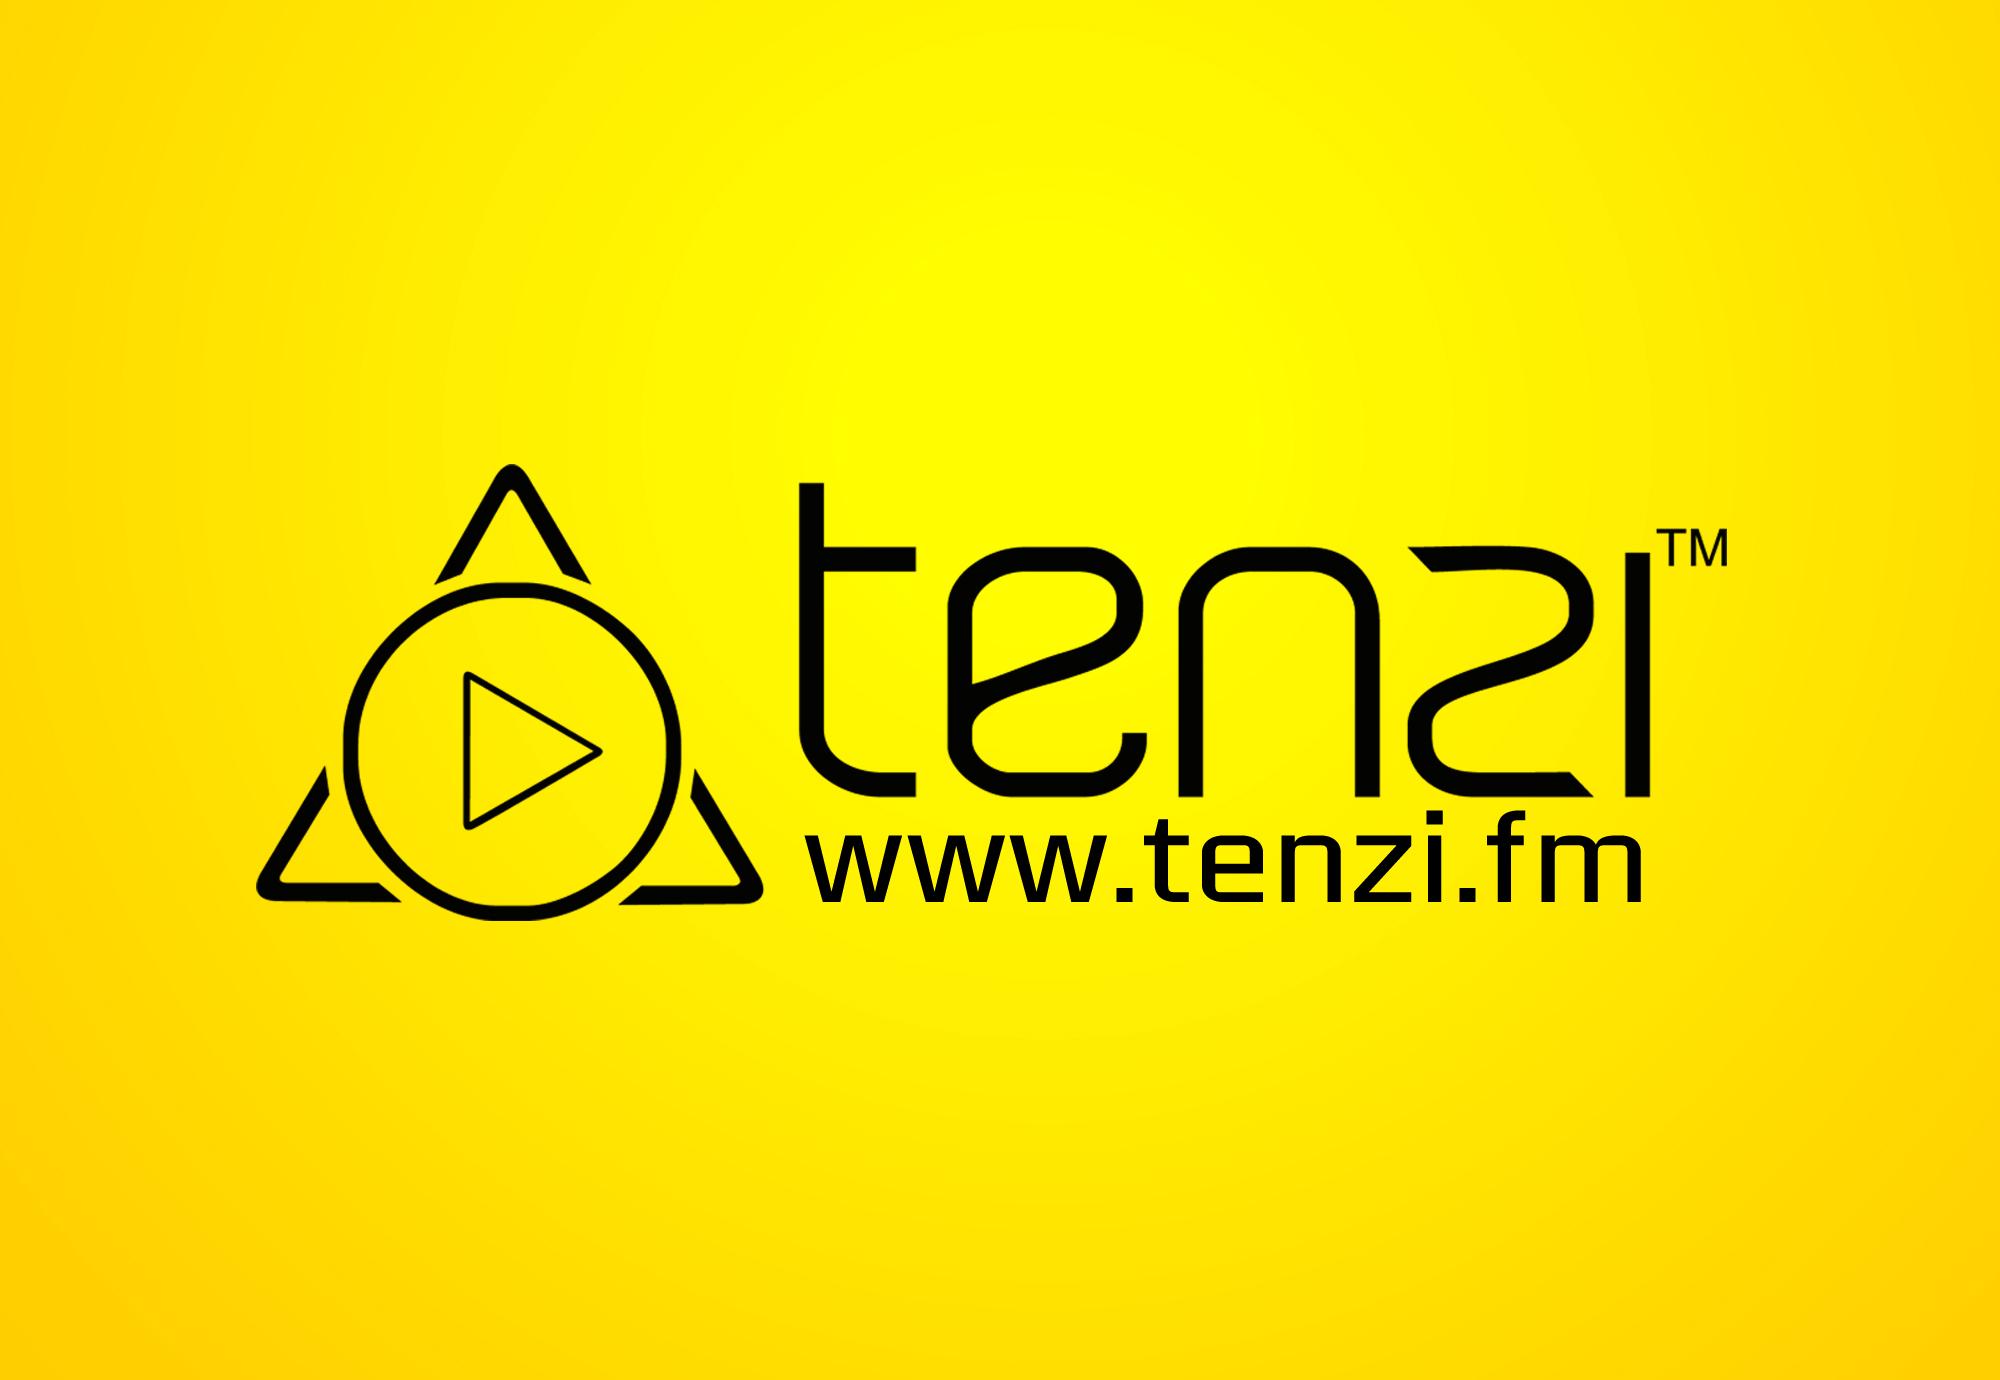 Tenzi FM